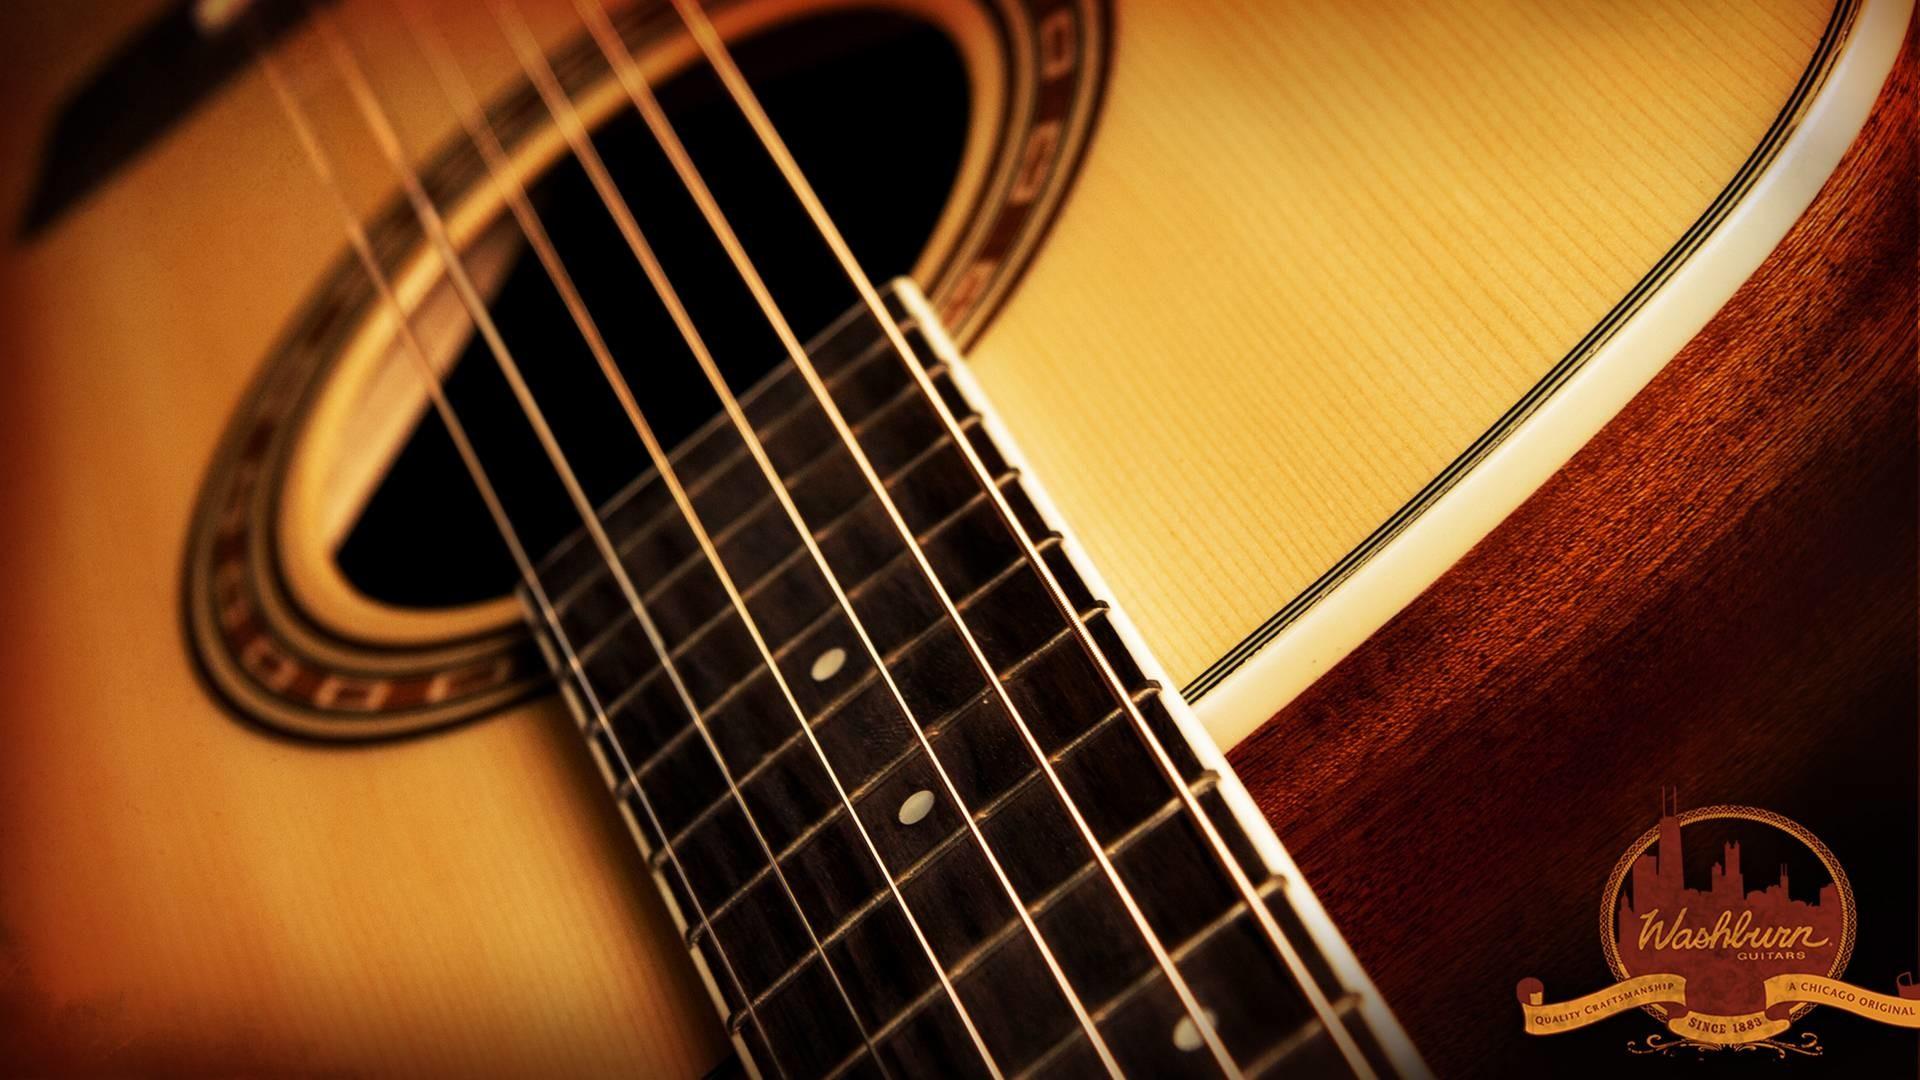 Washburn Guitars – Wallpaper